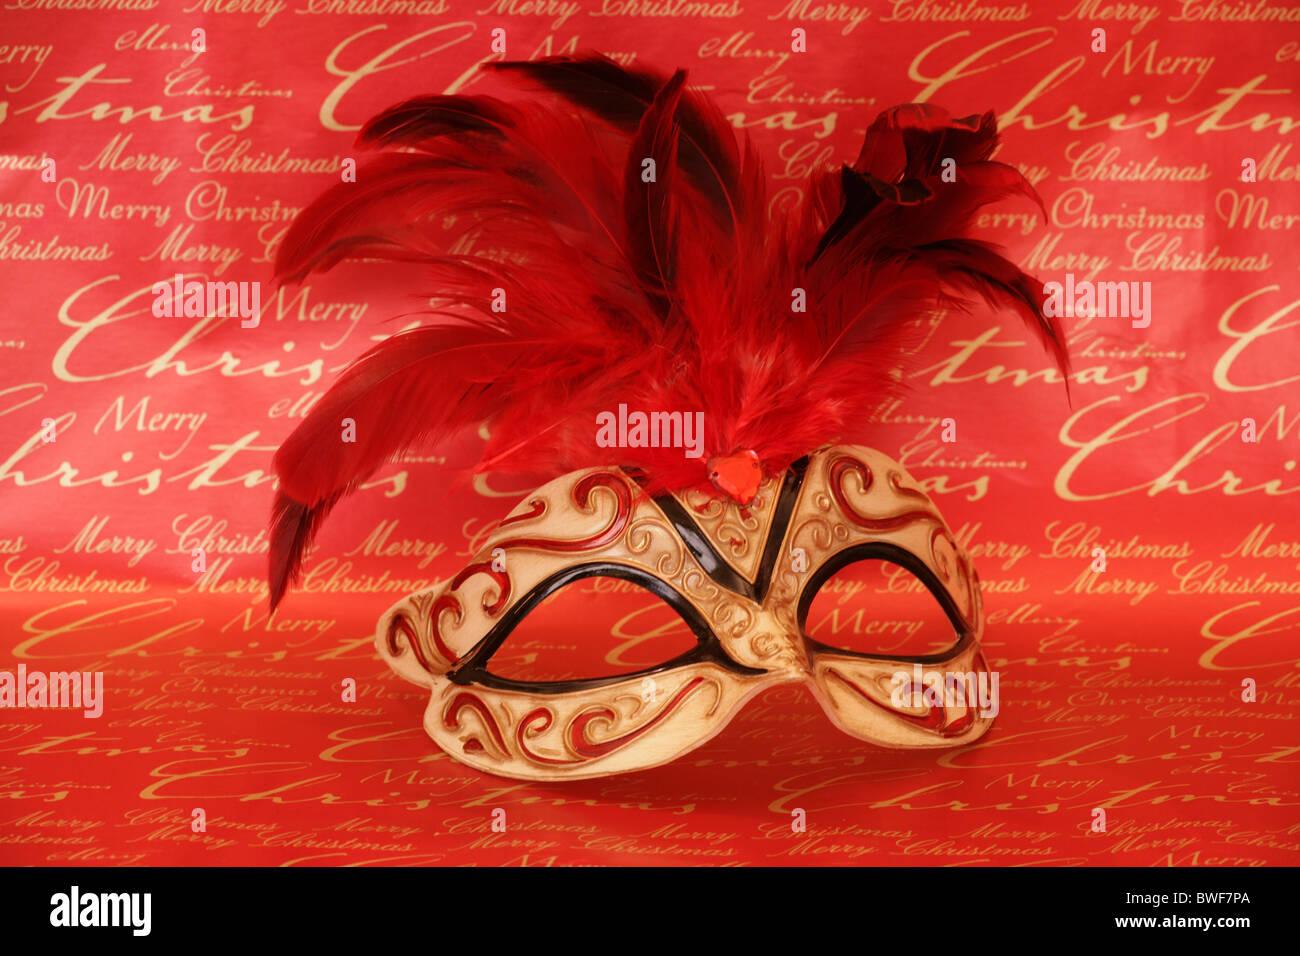 ddd421acb475 Christmas masquerade party mask studio Stock Photo: 32912162 - Alamy